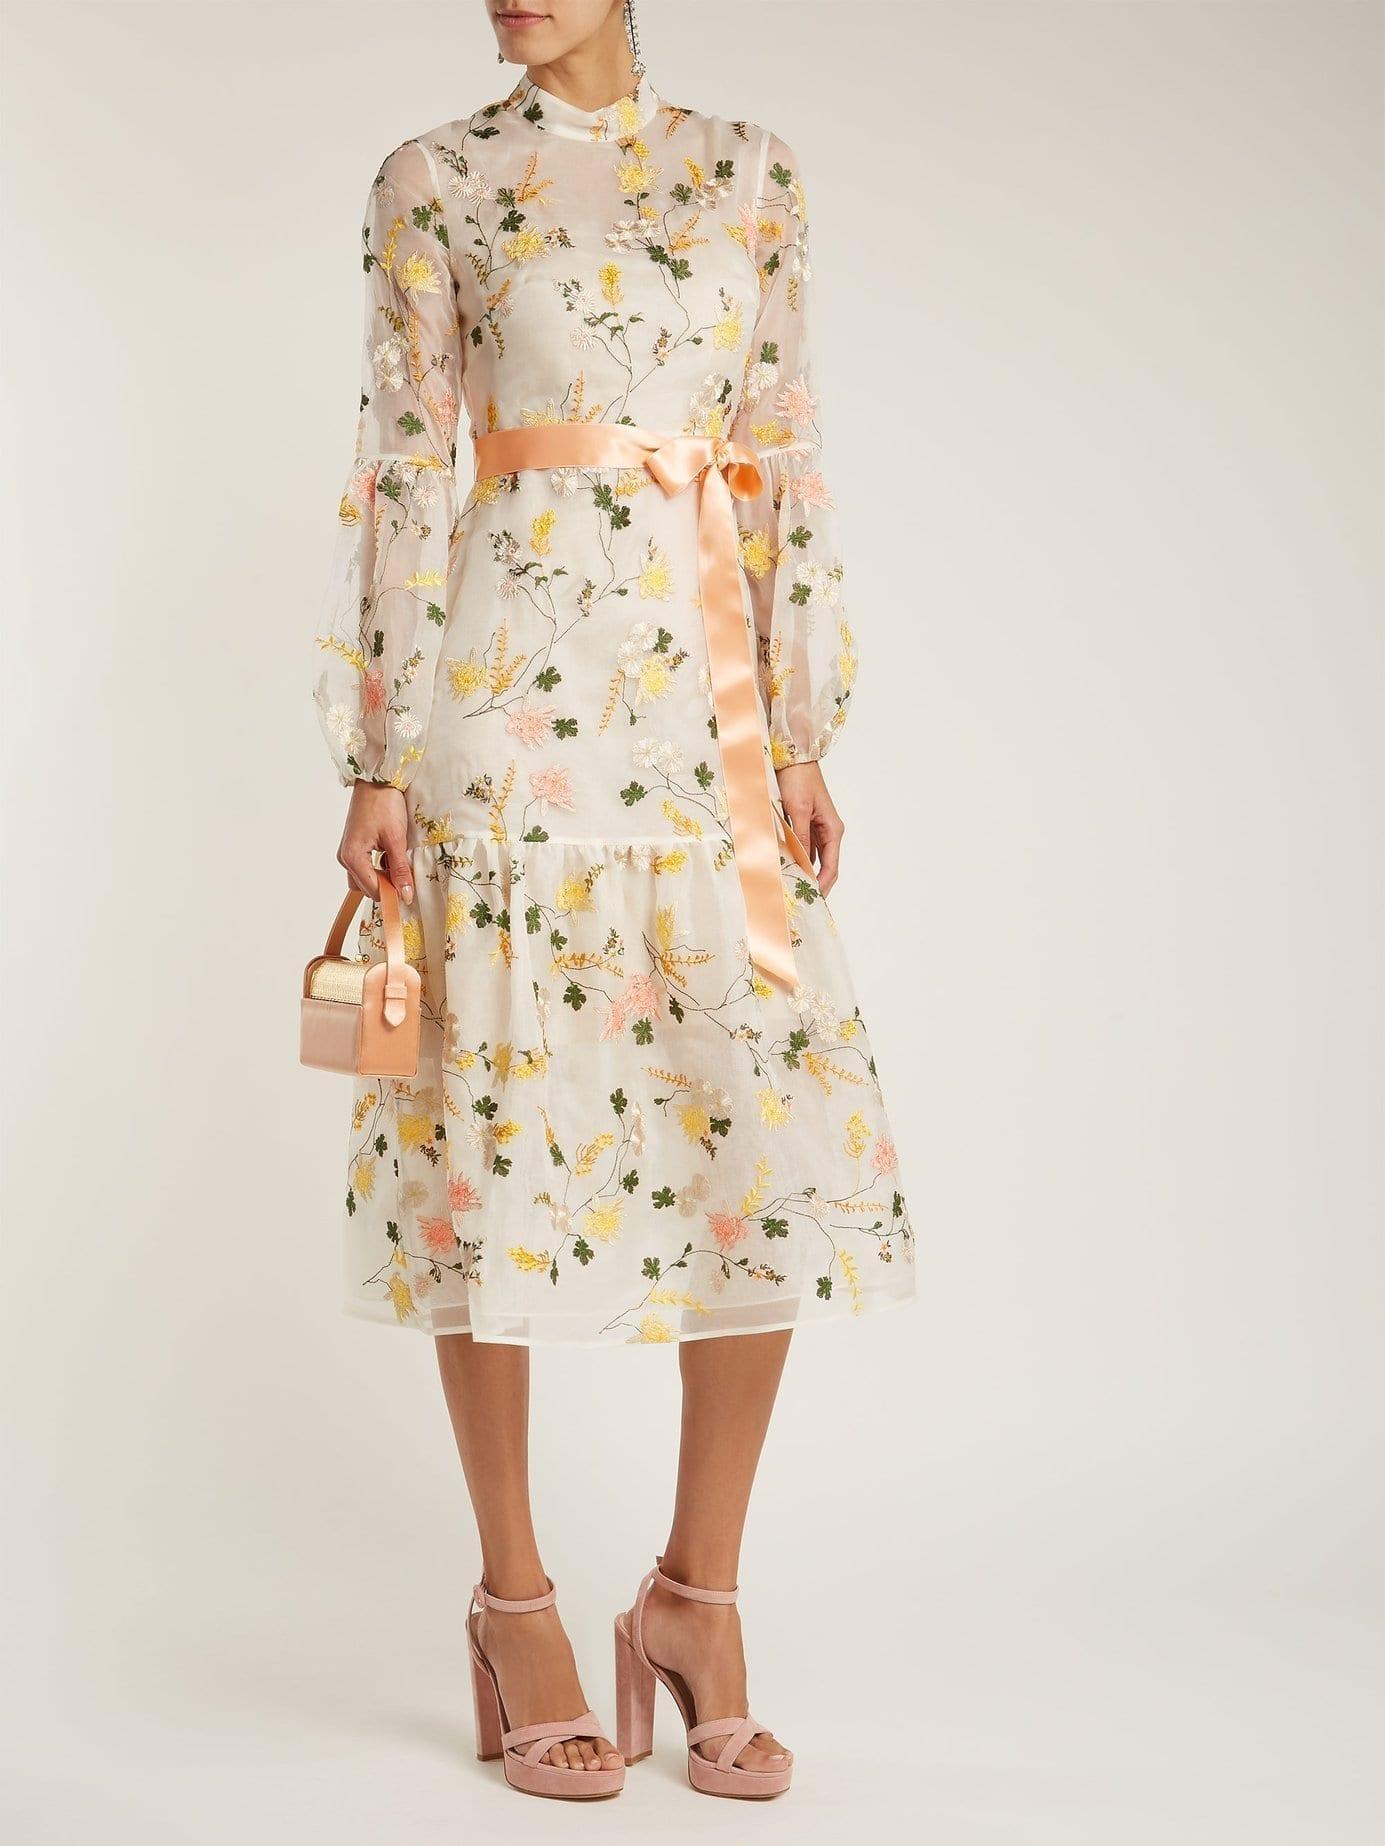 ERDEM Sandra Organza White / Floral Printed Gown